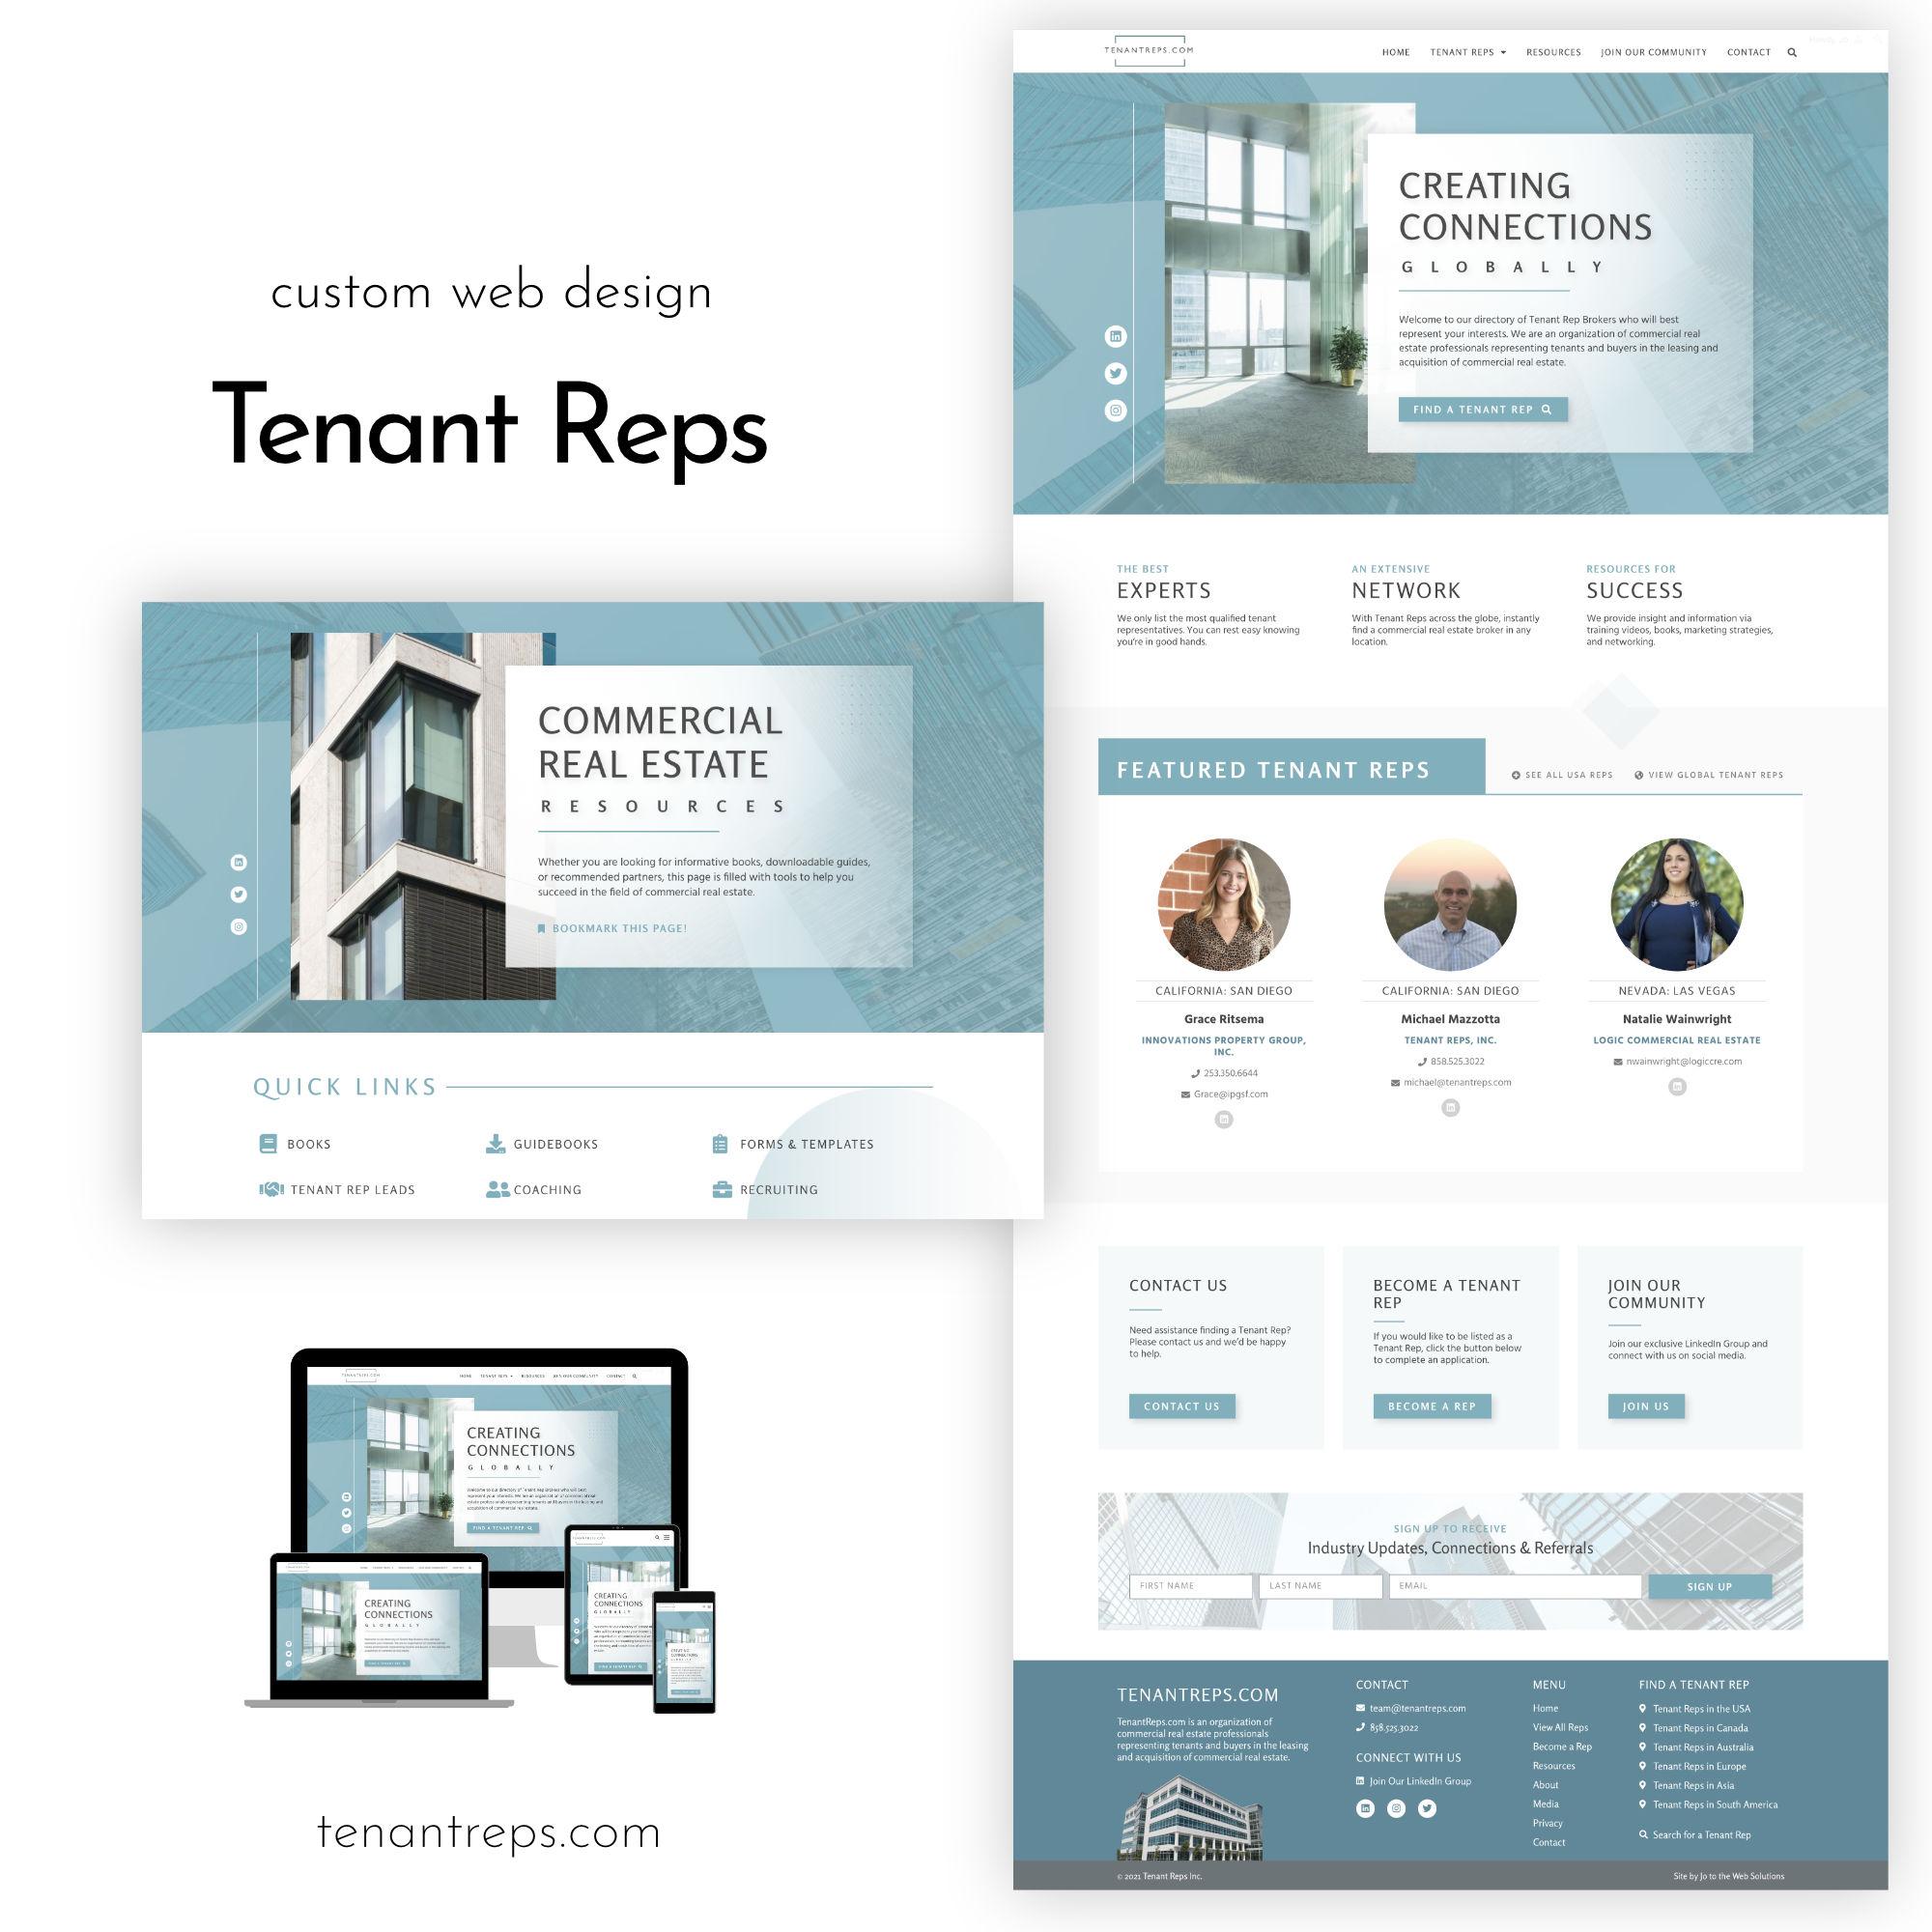 Tenant Reps Website